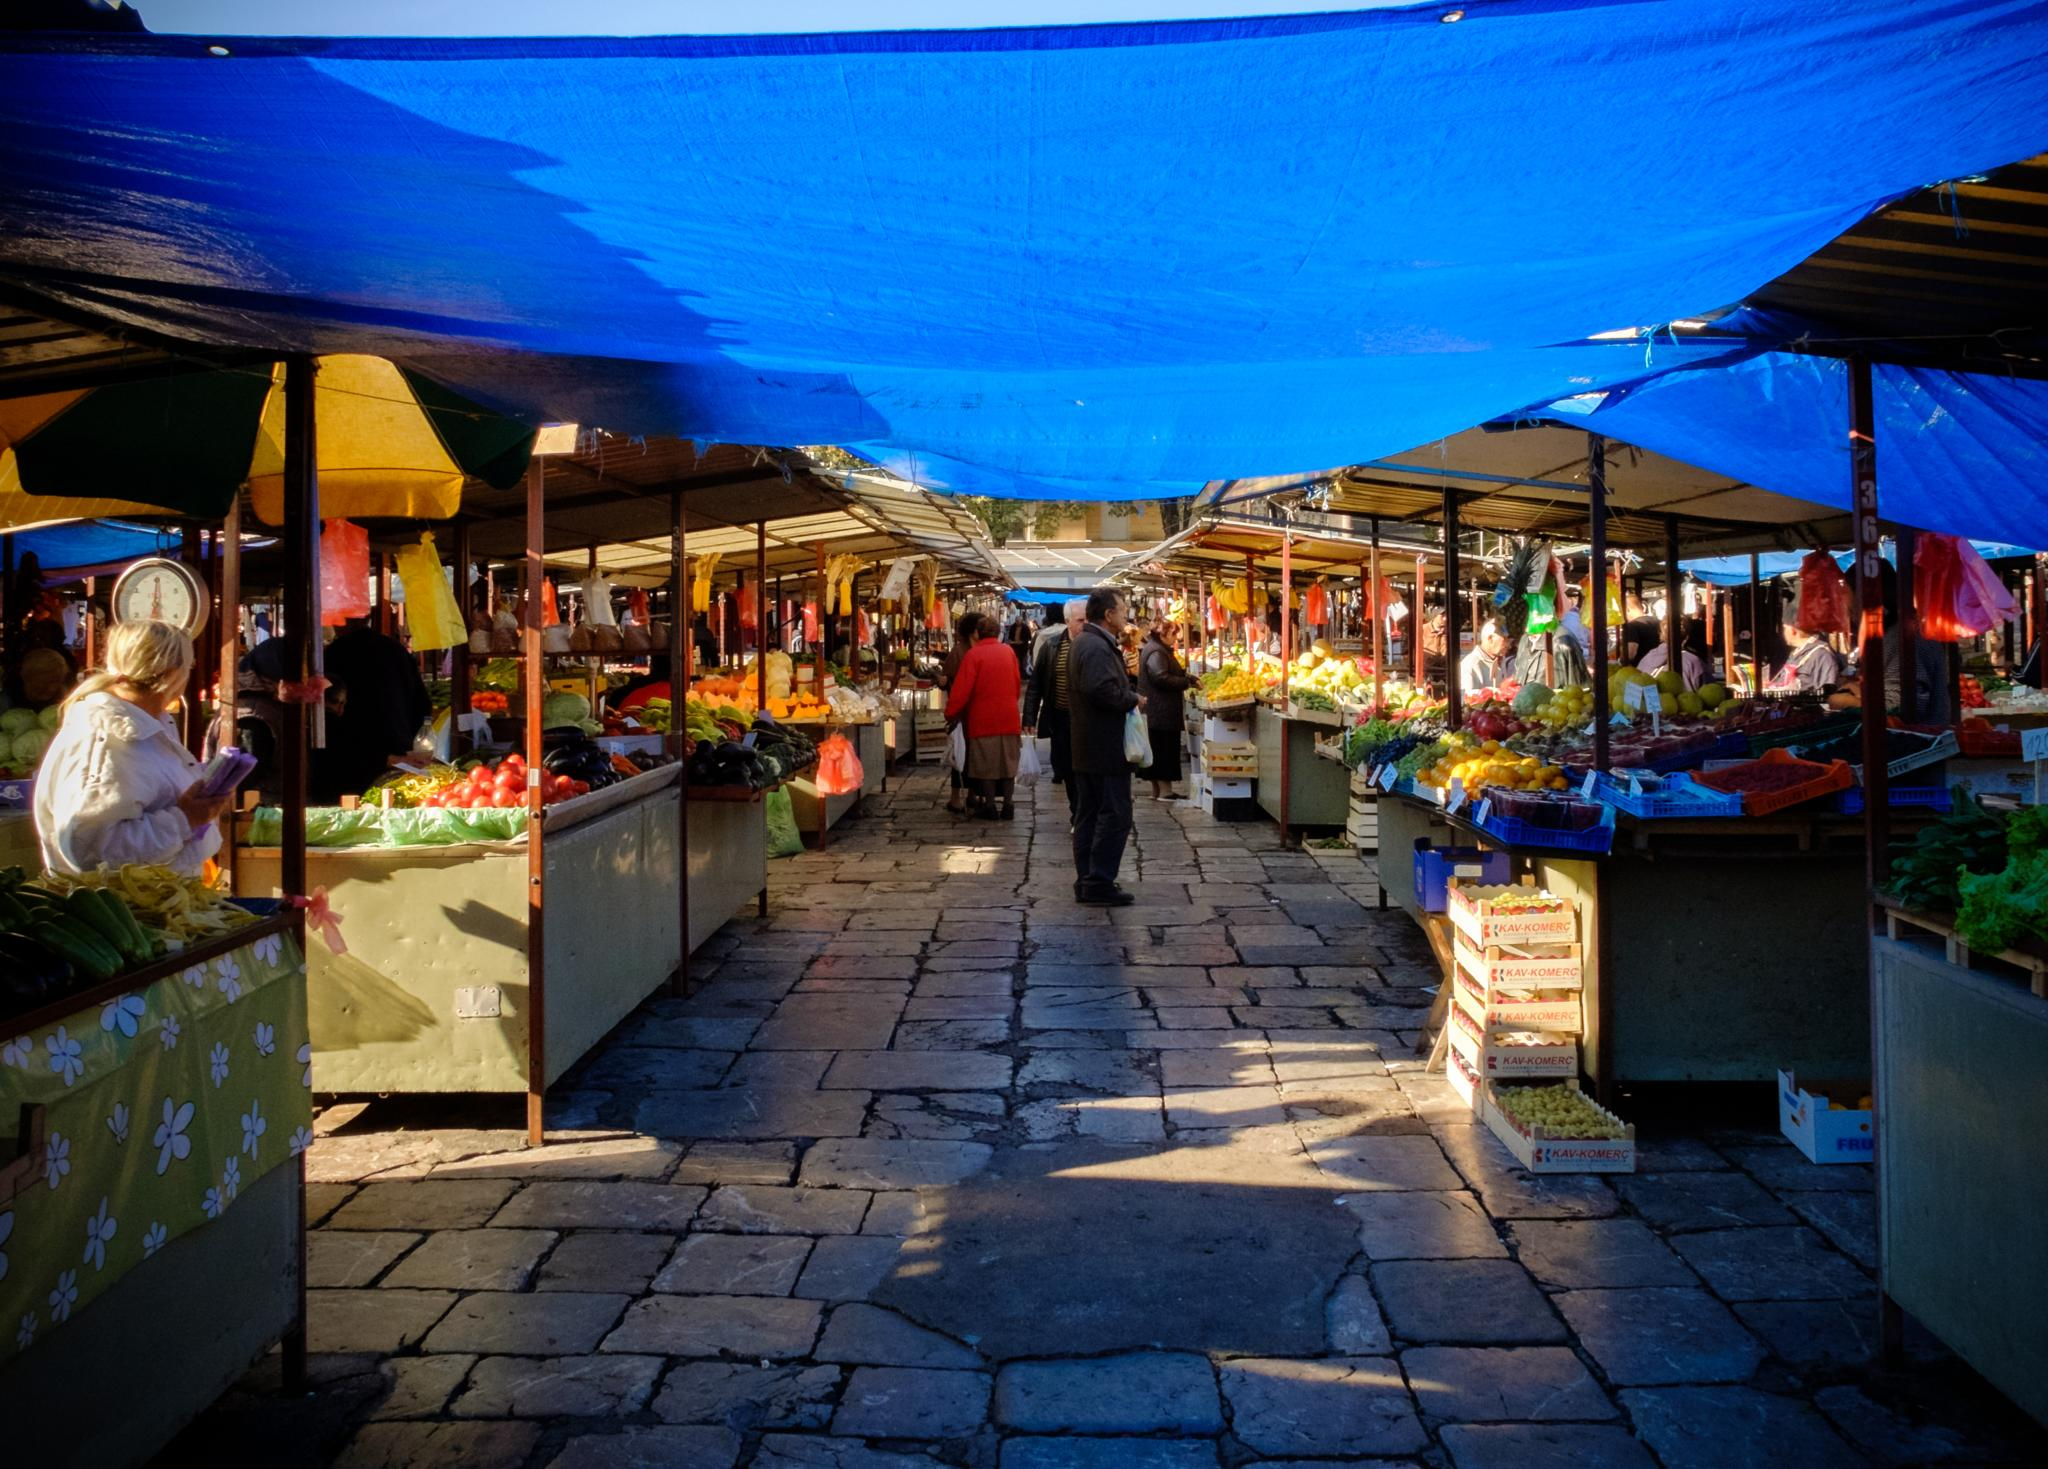 Belgrade market by Mikhail Gnutov